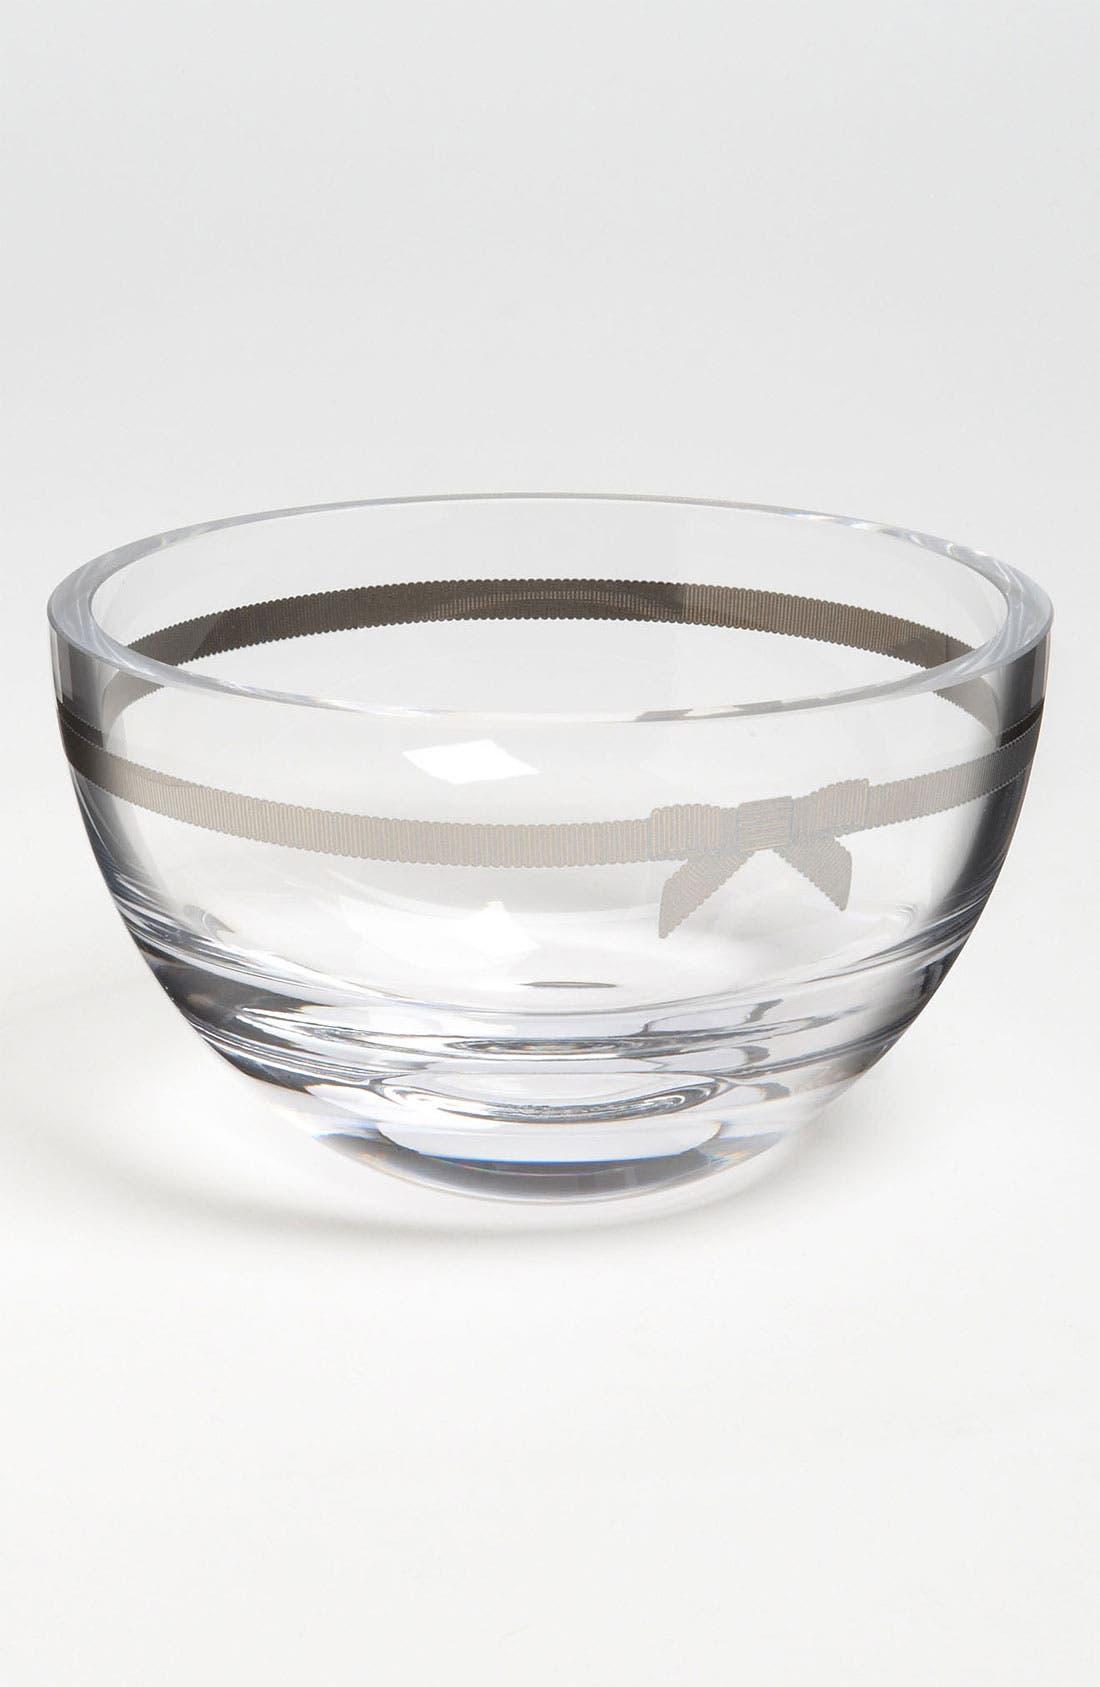 Main Image - kate spade new york 'grace avenue - small' bowl